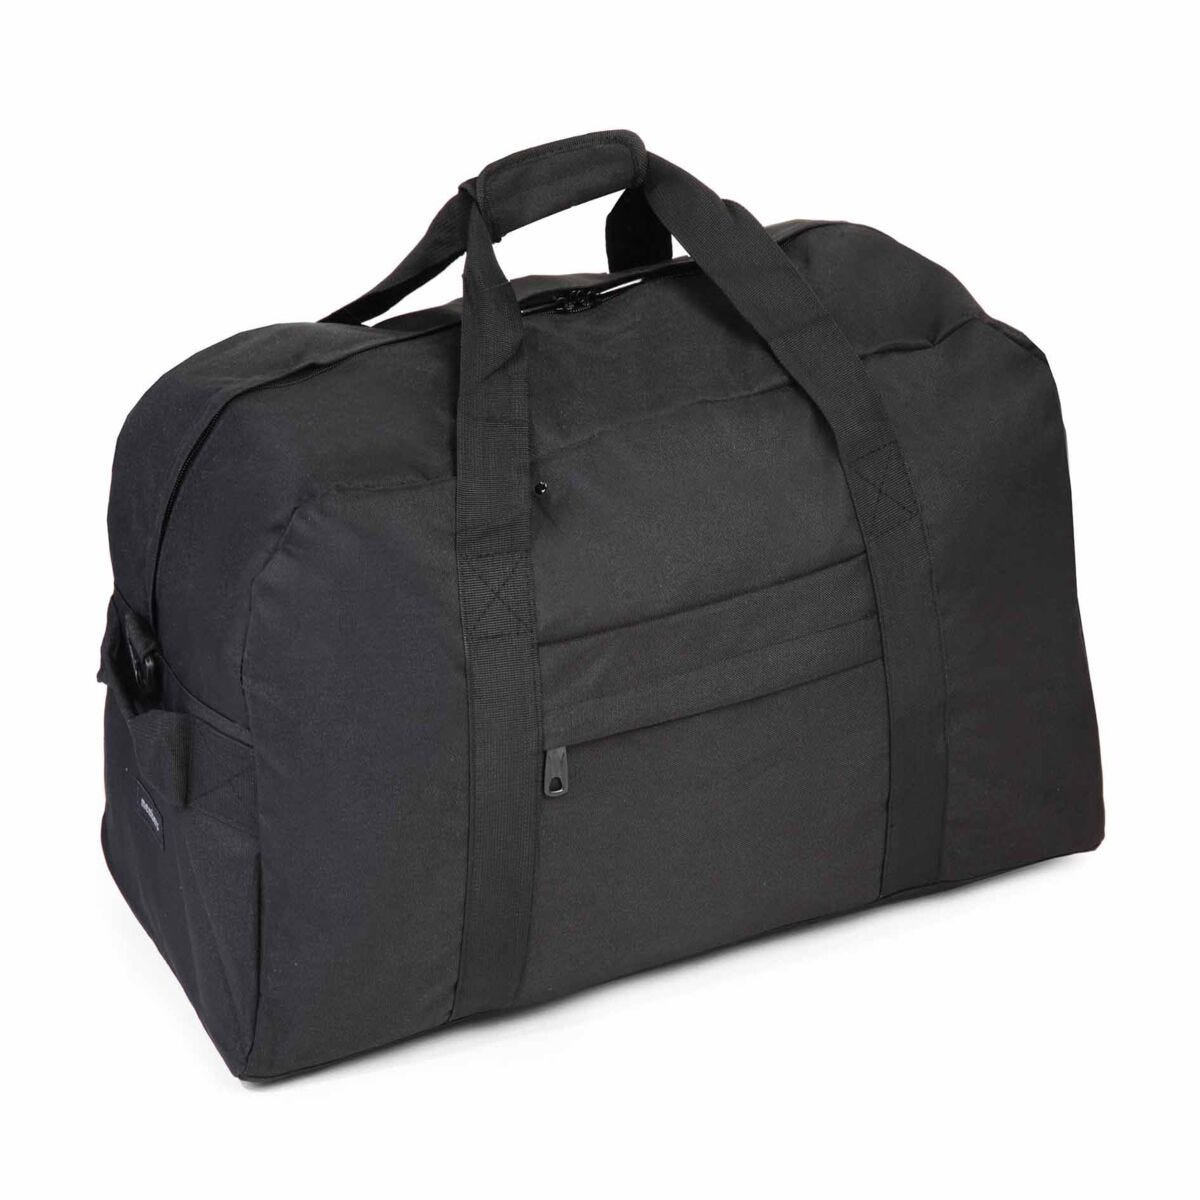 Members by Rock Medium Holdall and Duffle Bag 65cm